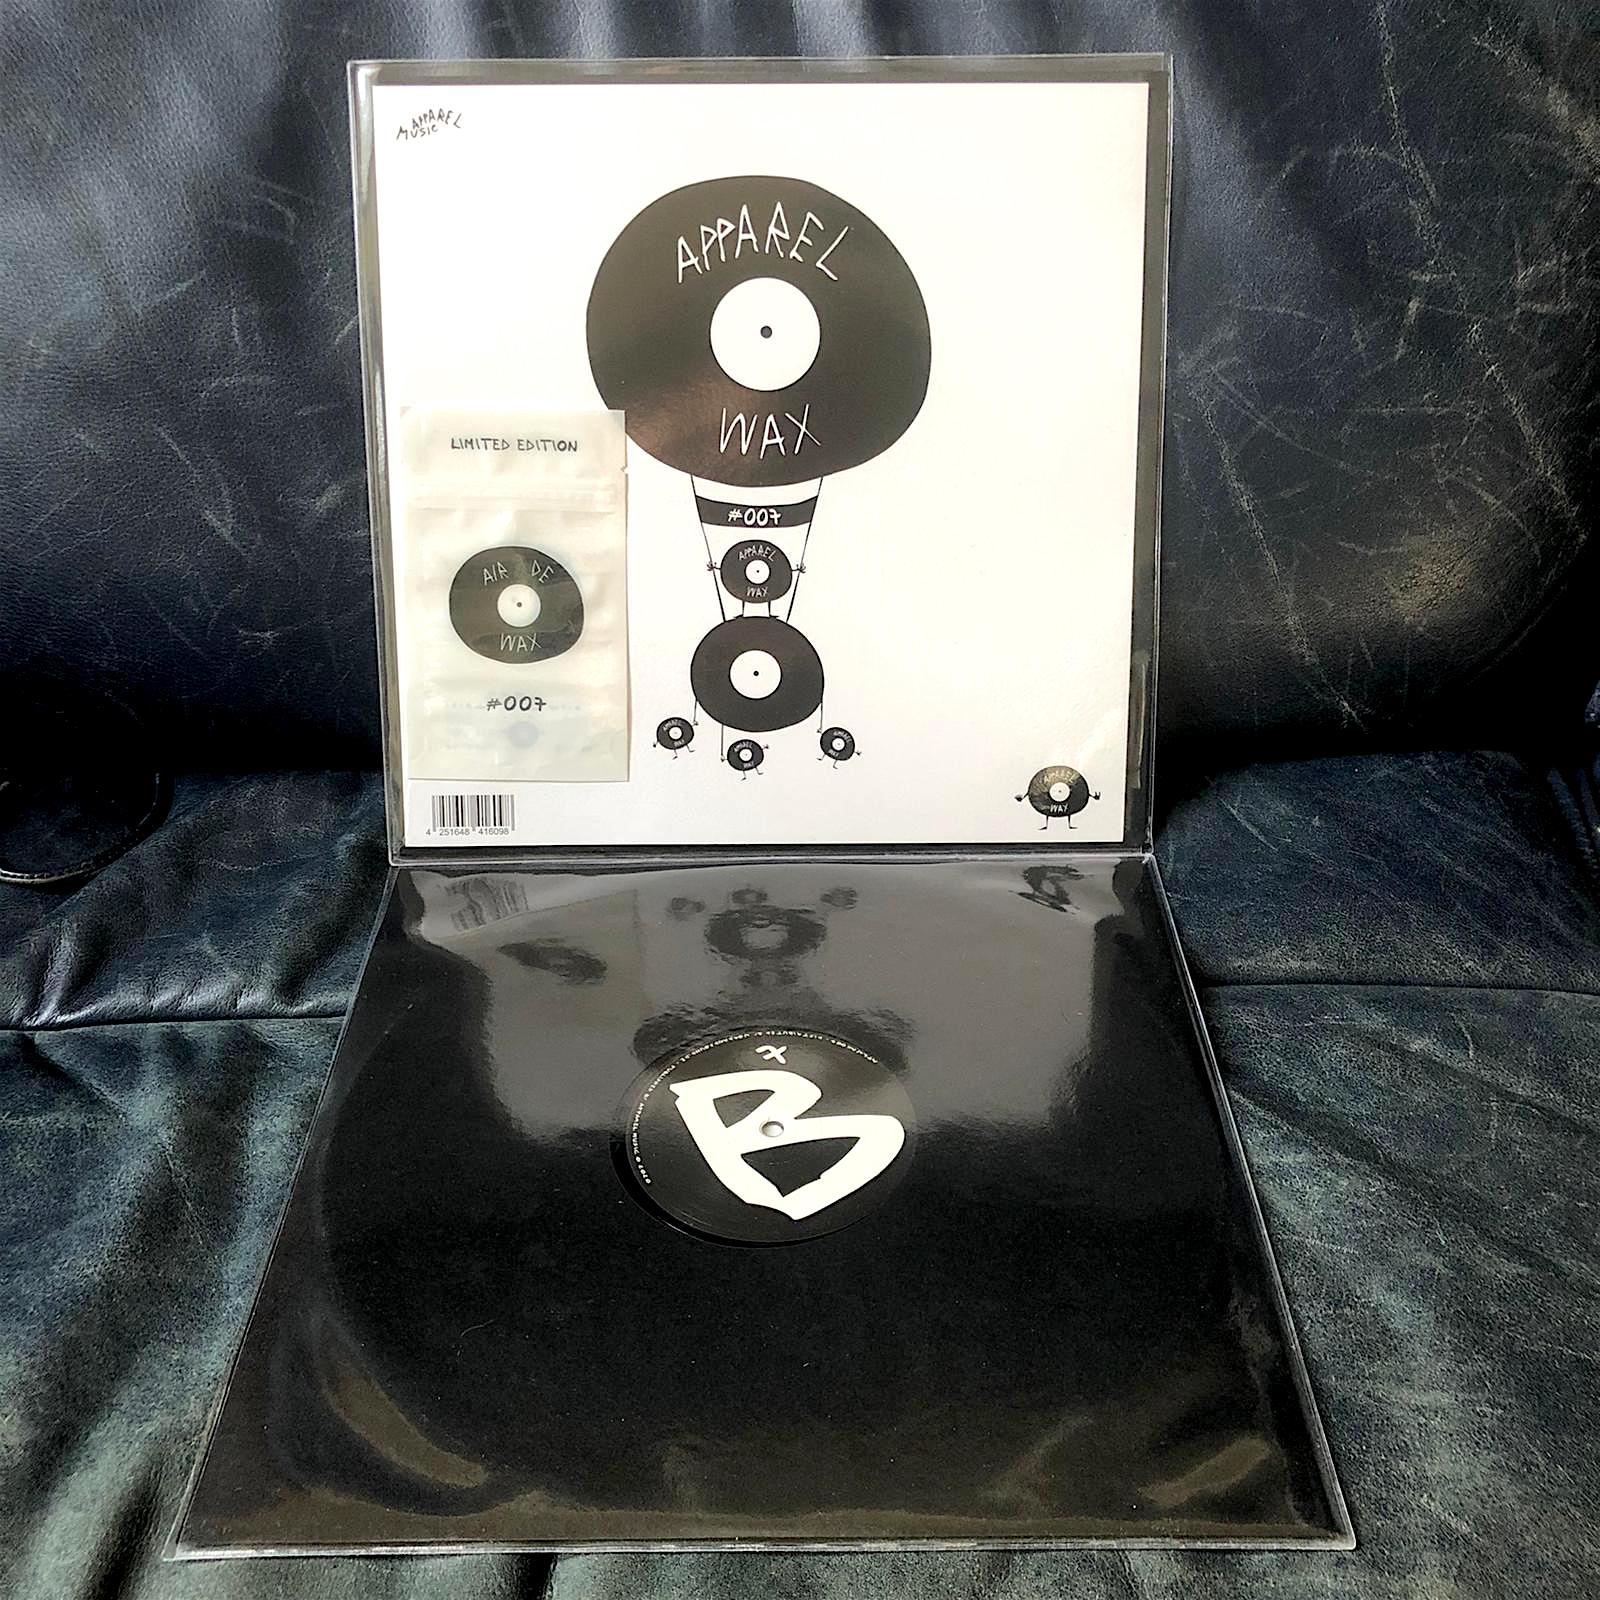 APLWAX007 Kit